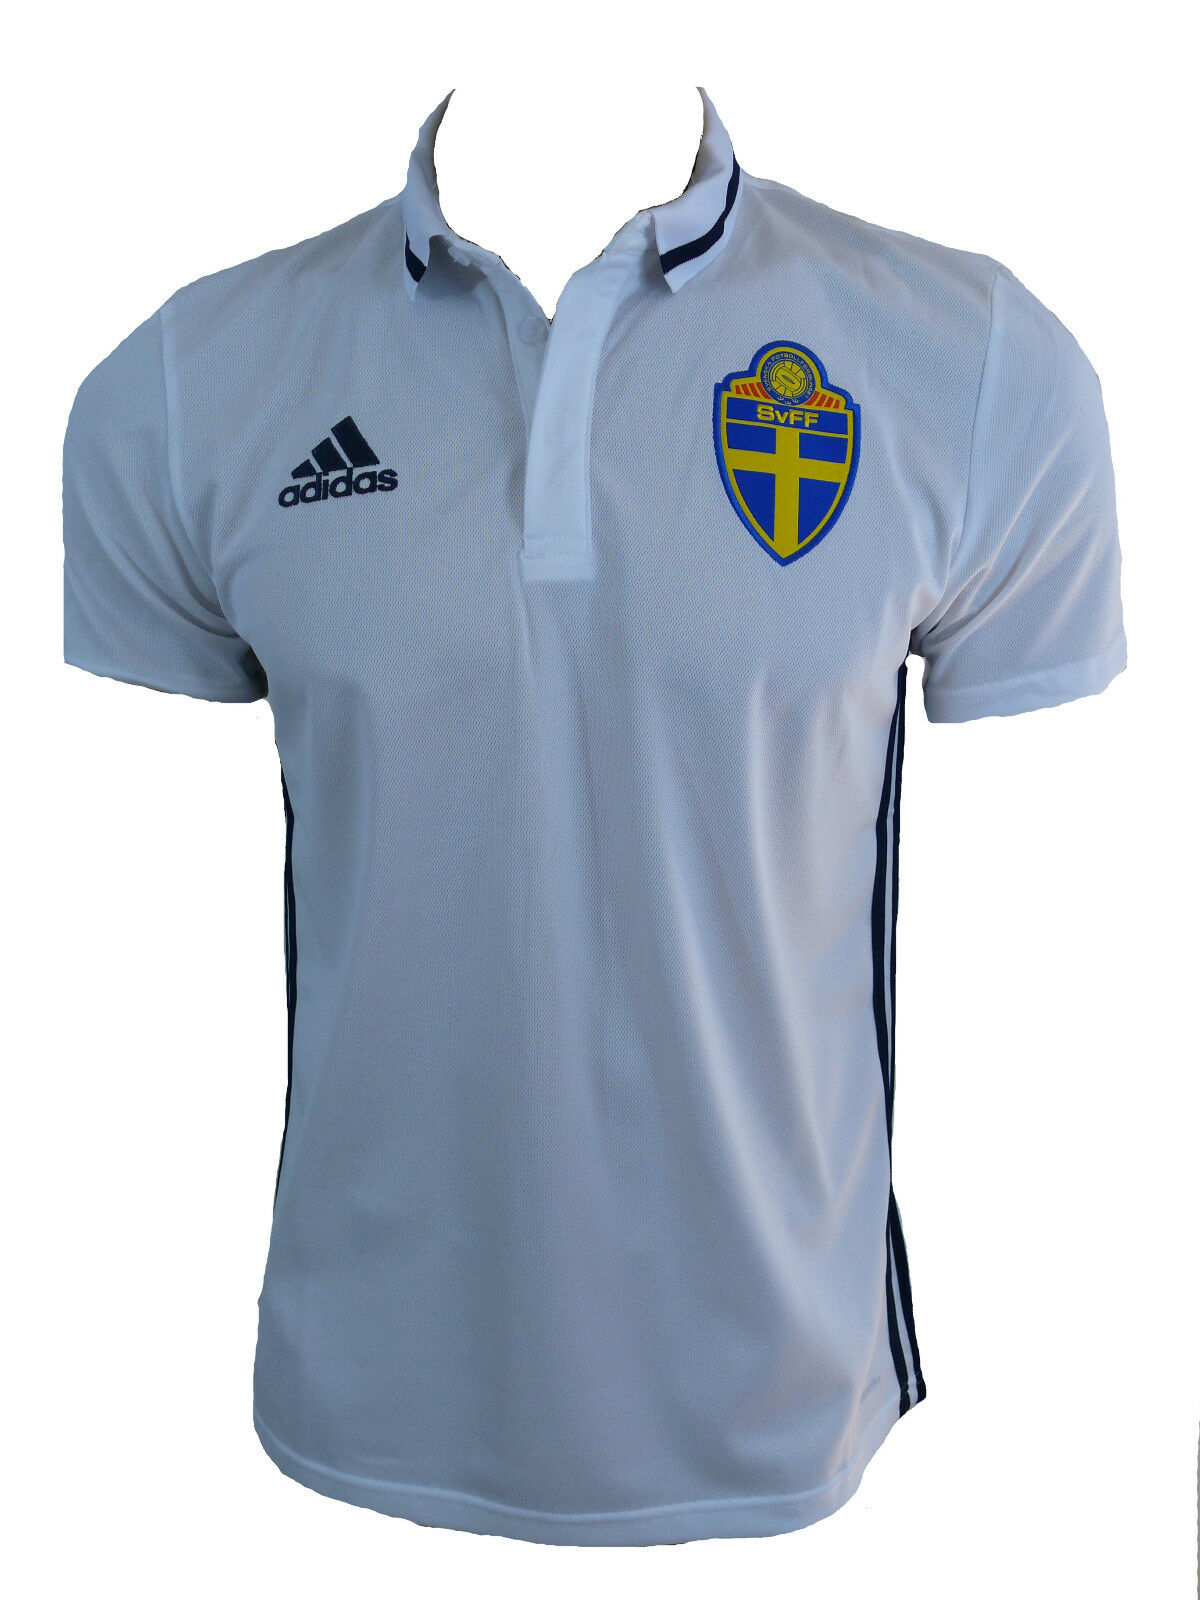 Adidas Suecia Suecia Suecia Svff Camiseta Polo Talla XXL Nuevo  barato